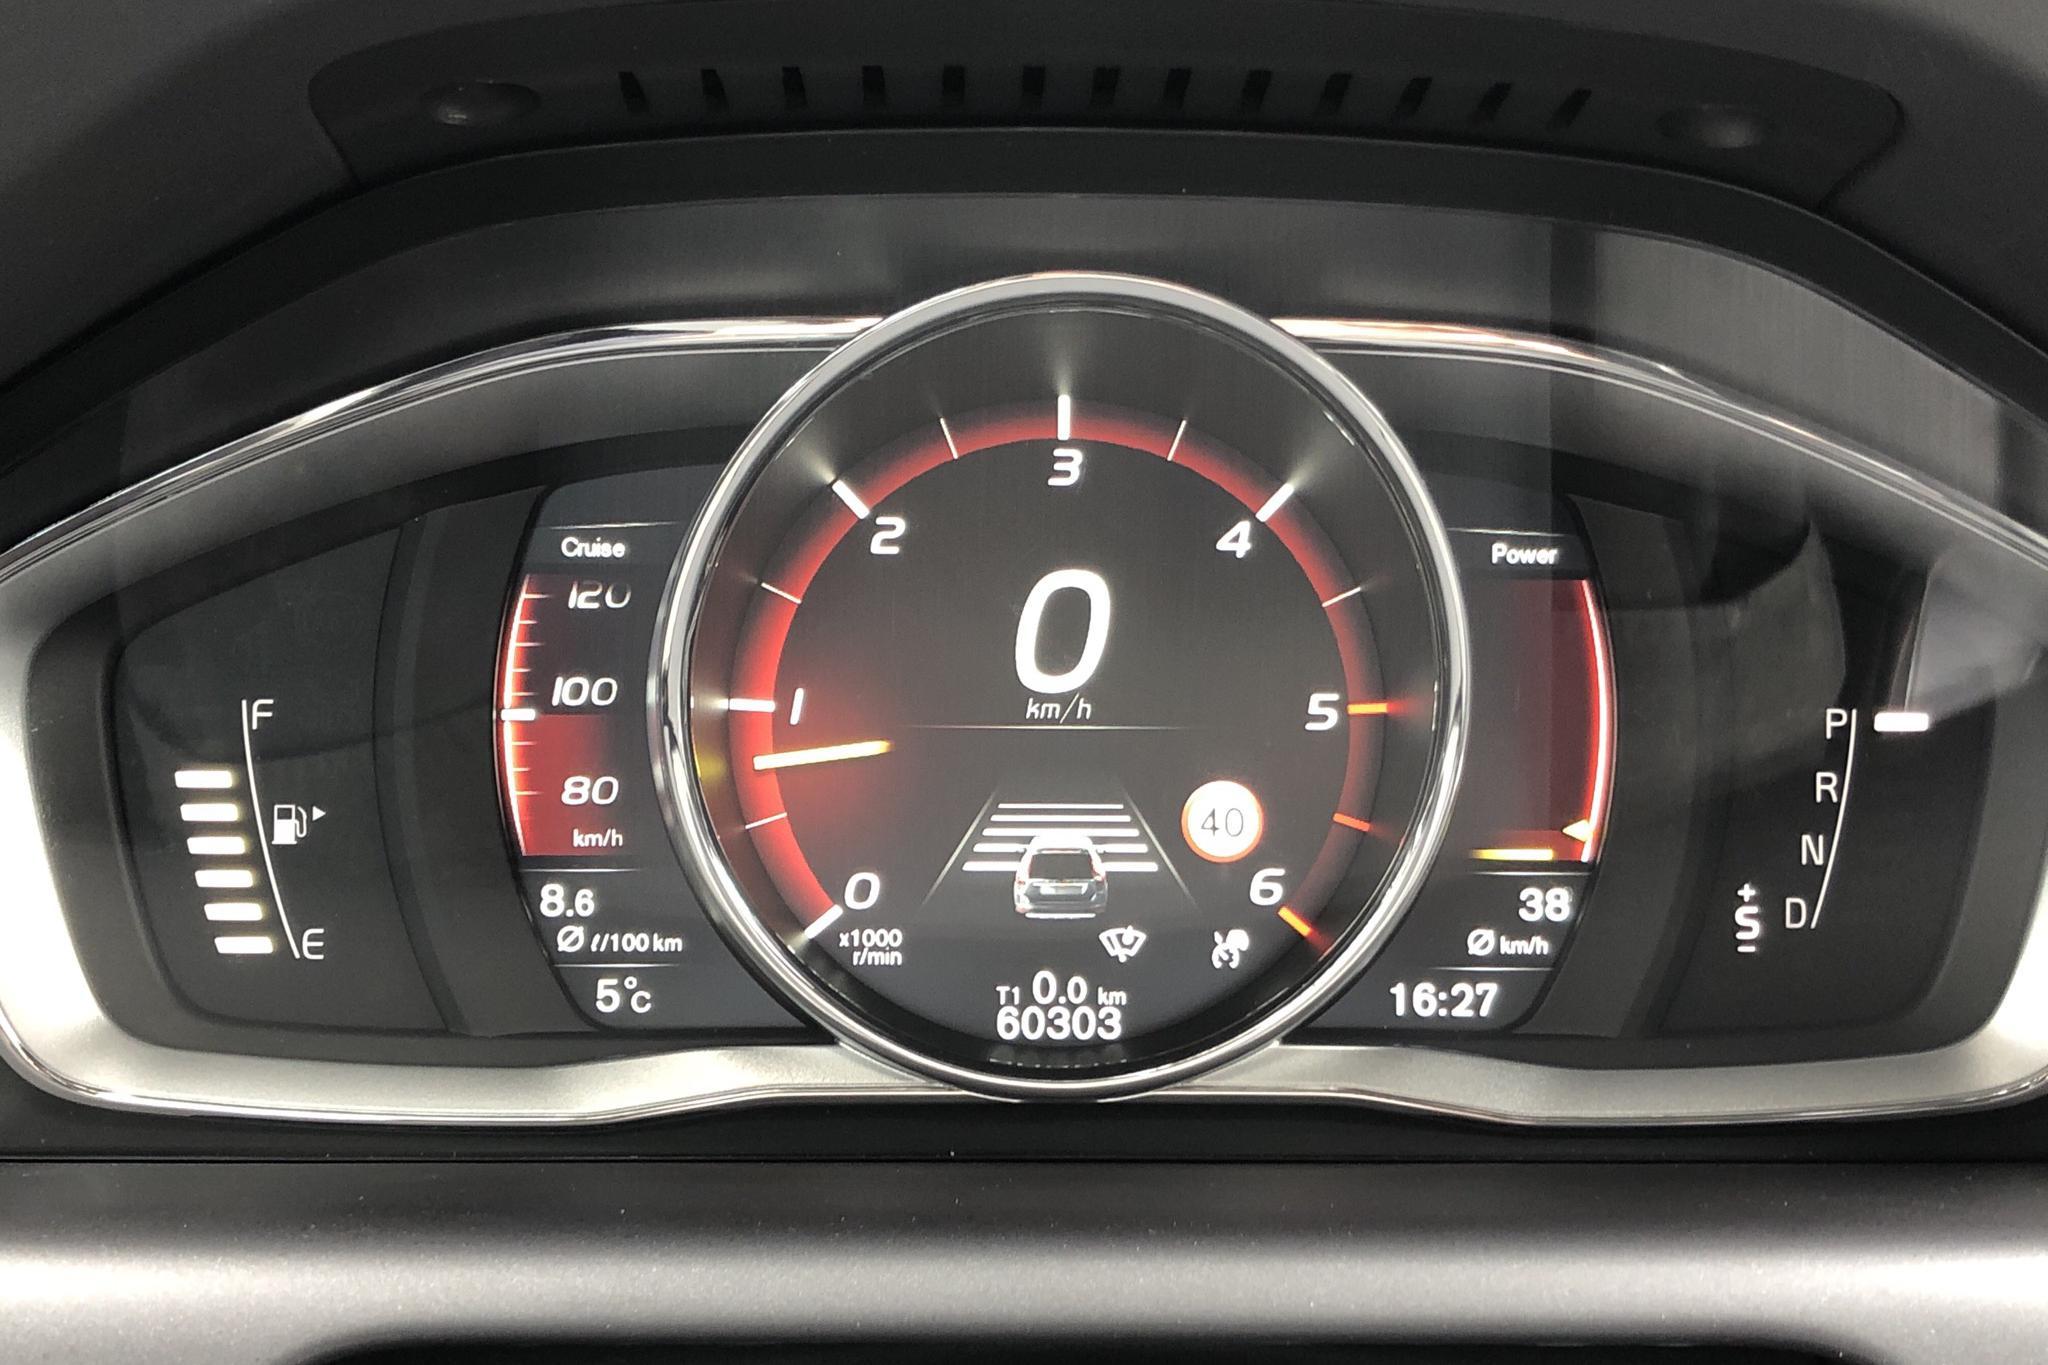 Volvo XC60 D4 AWD (190hk) - 60 300 km - Automatic - Dark Blue - 2017